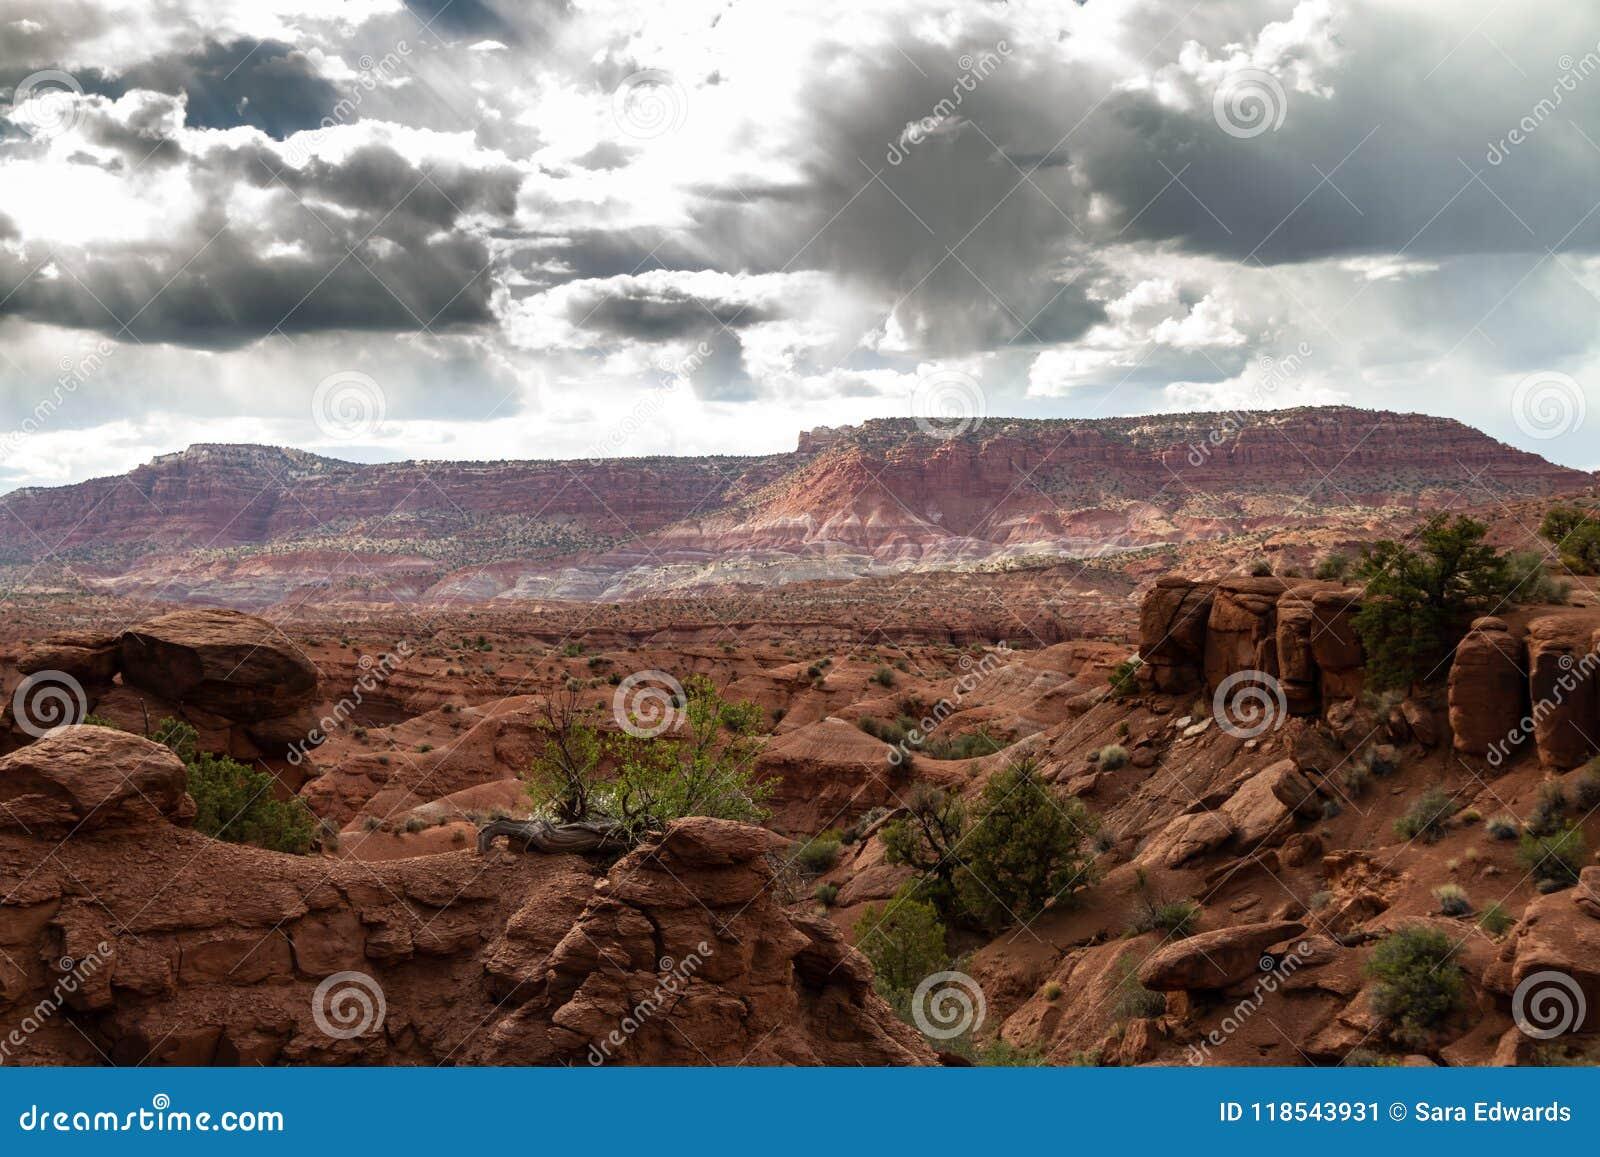 Großartige Sturmwolken über großartigem Treppenhaus-Escalante-Nationaldenkmal in Paria, Utah